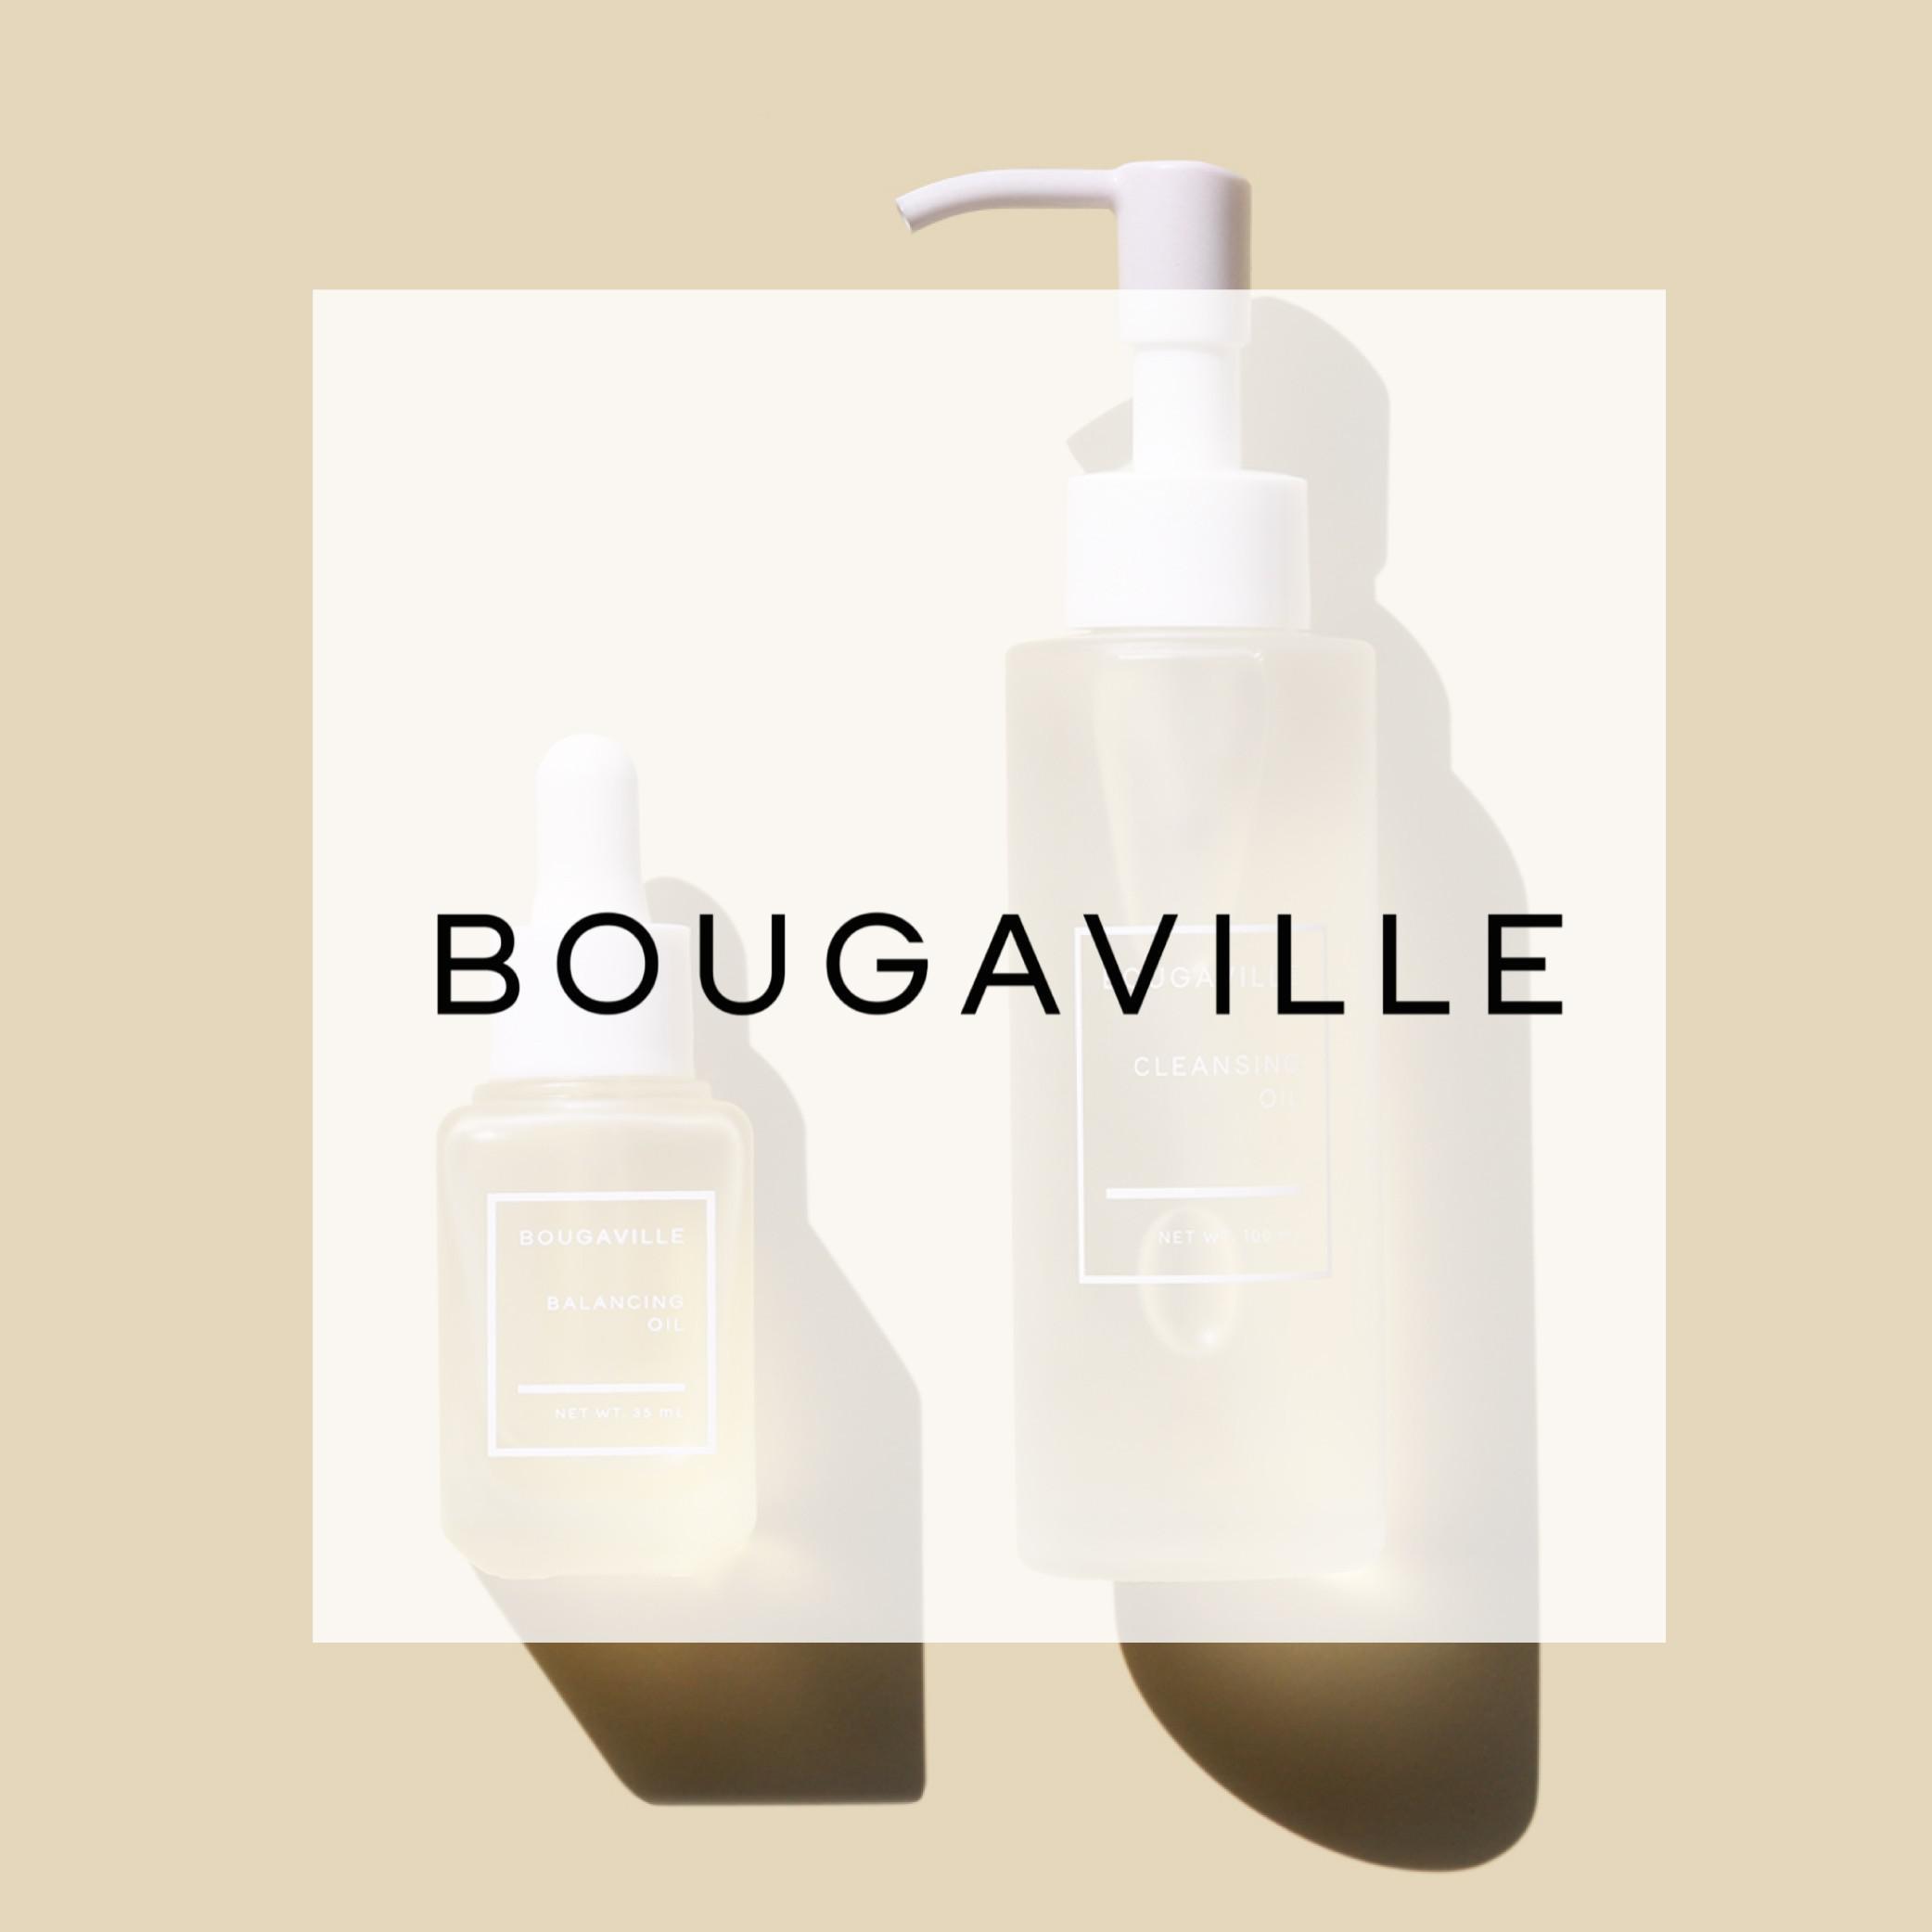 Bougaville